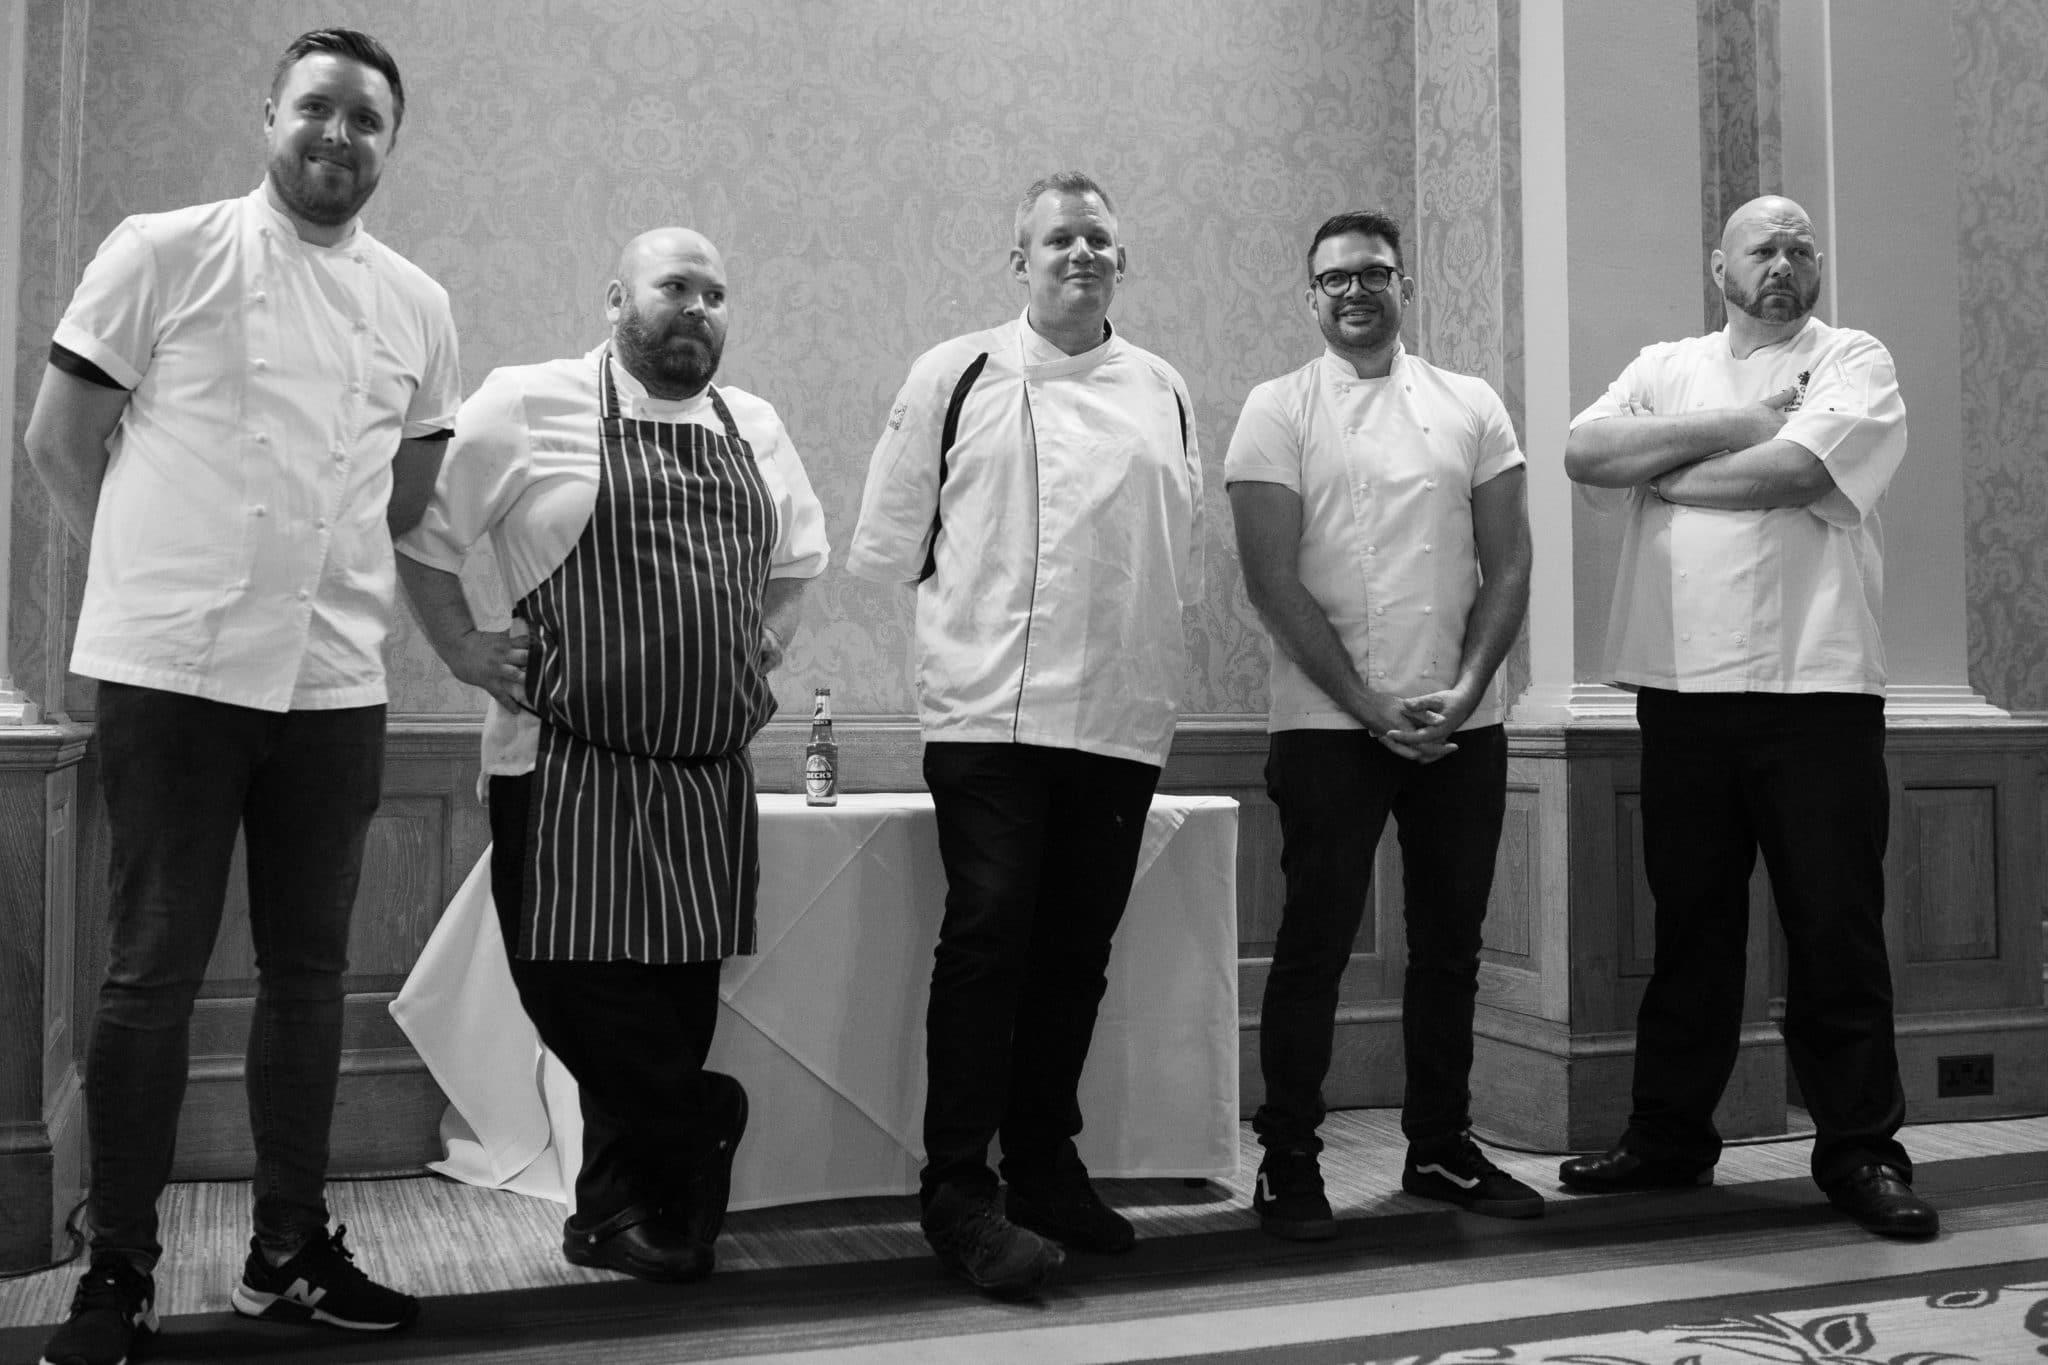 Brighton Chefs Table 2019 - Duncan Ray, Kenny Tutt, Alan White, David Marrow, Steven Edwards